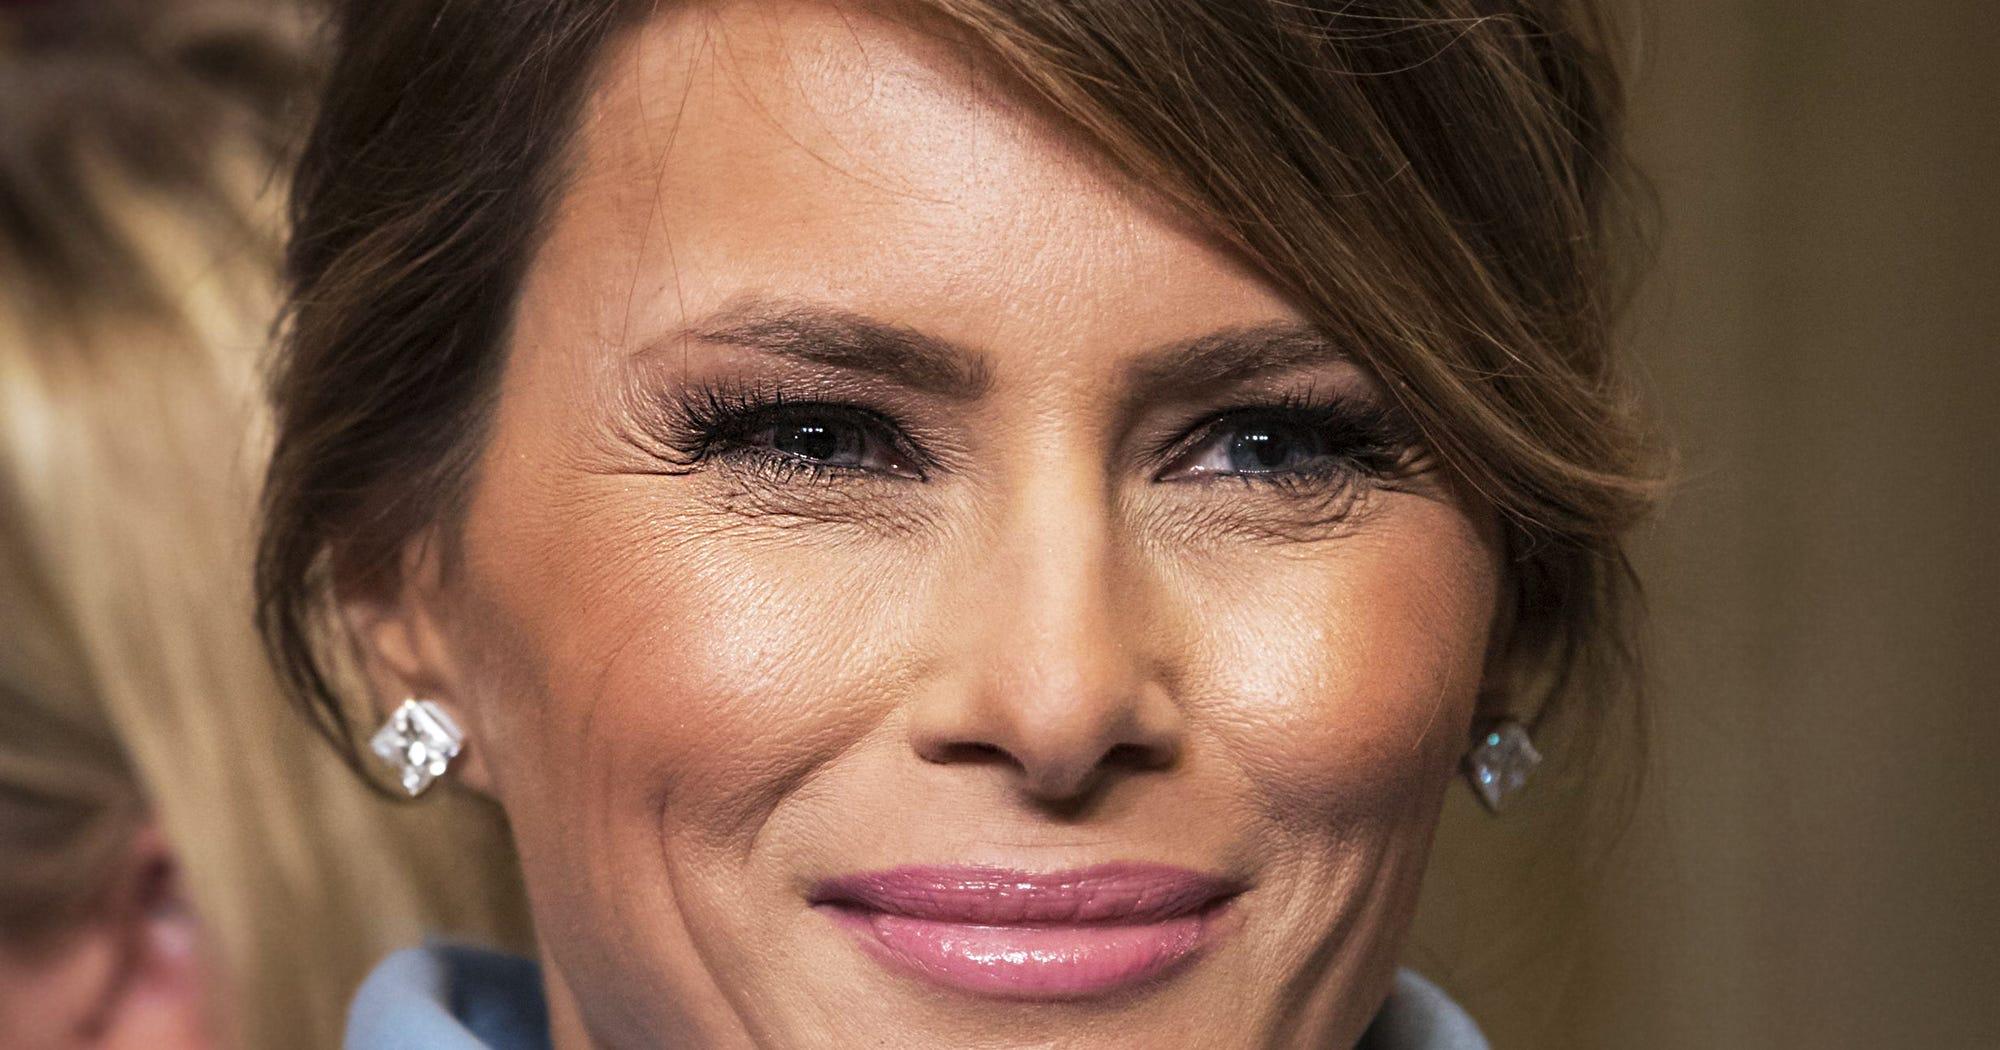 Фото мелании трамп без макияжа